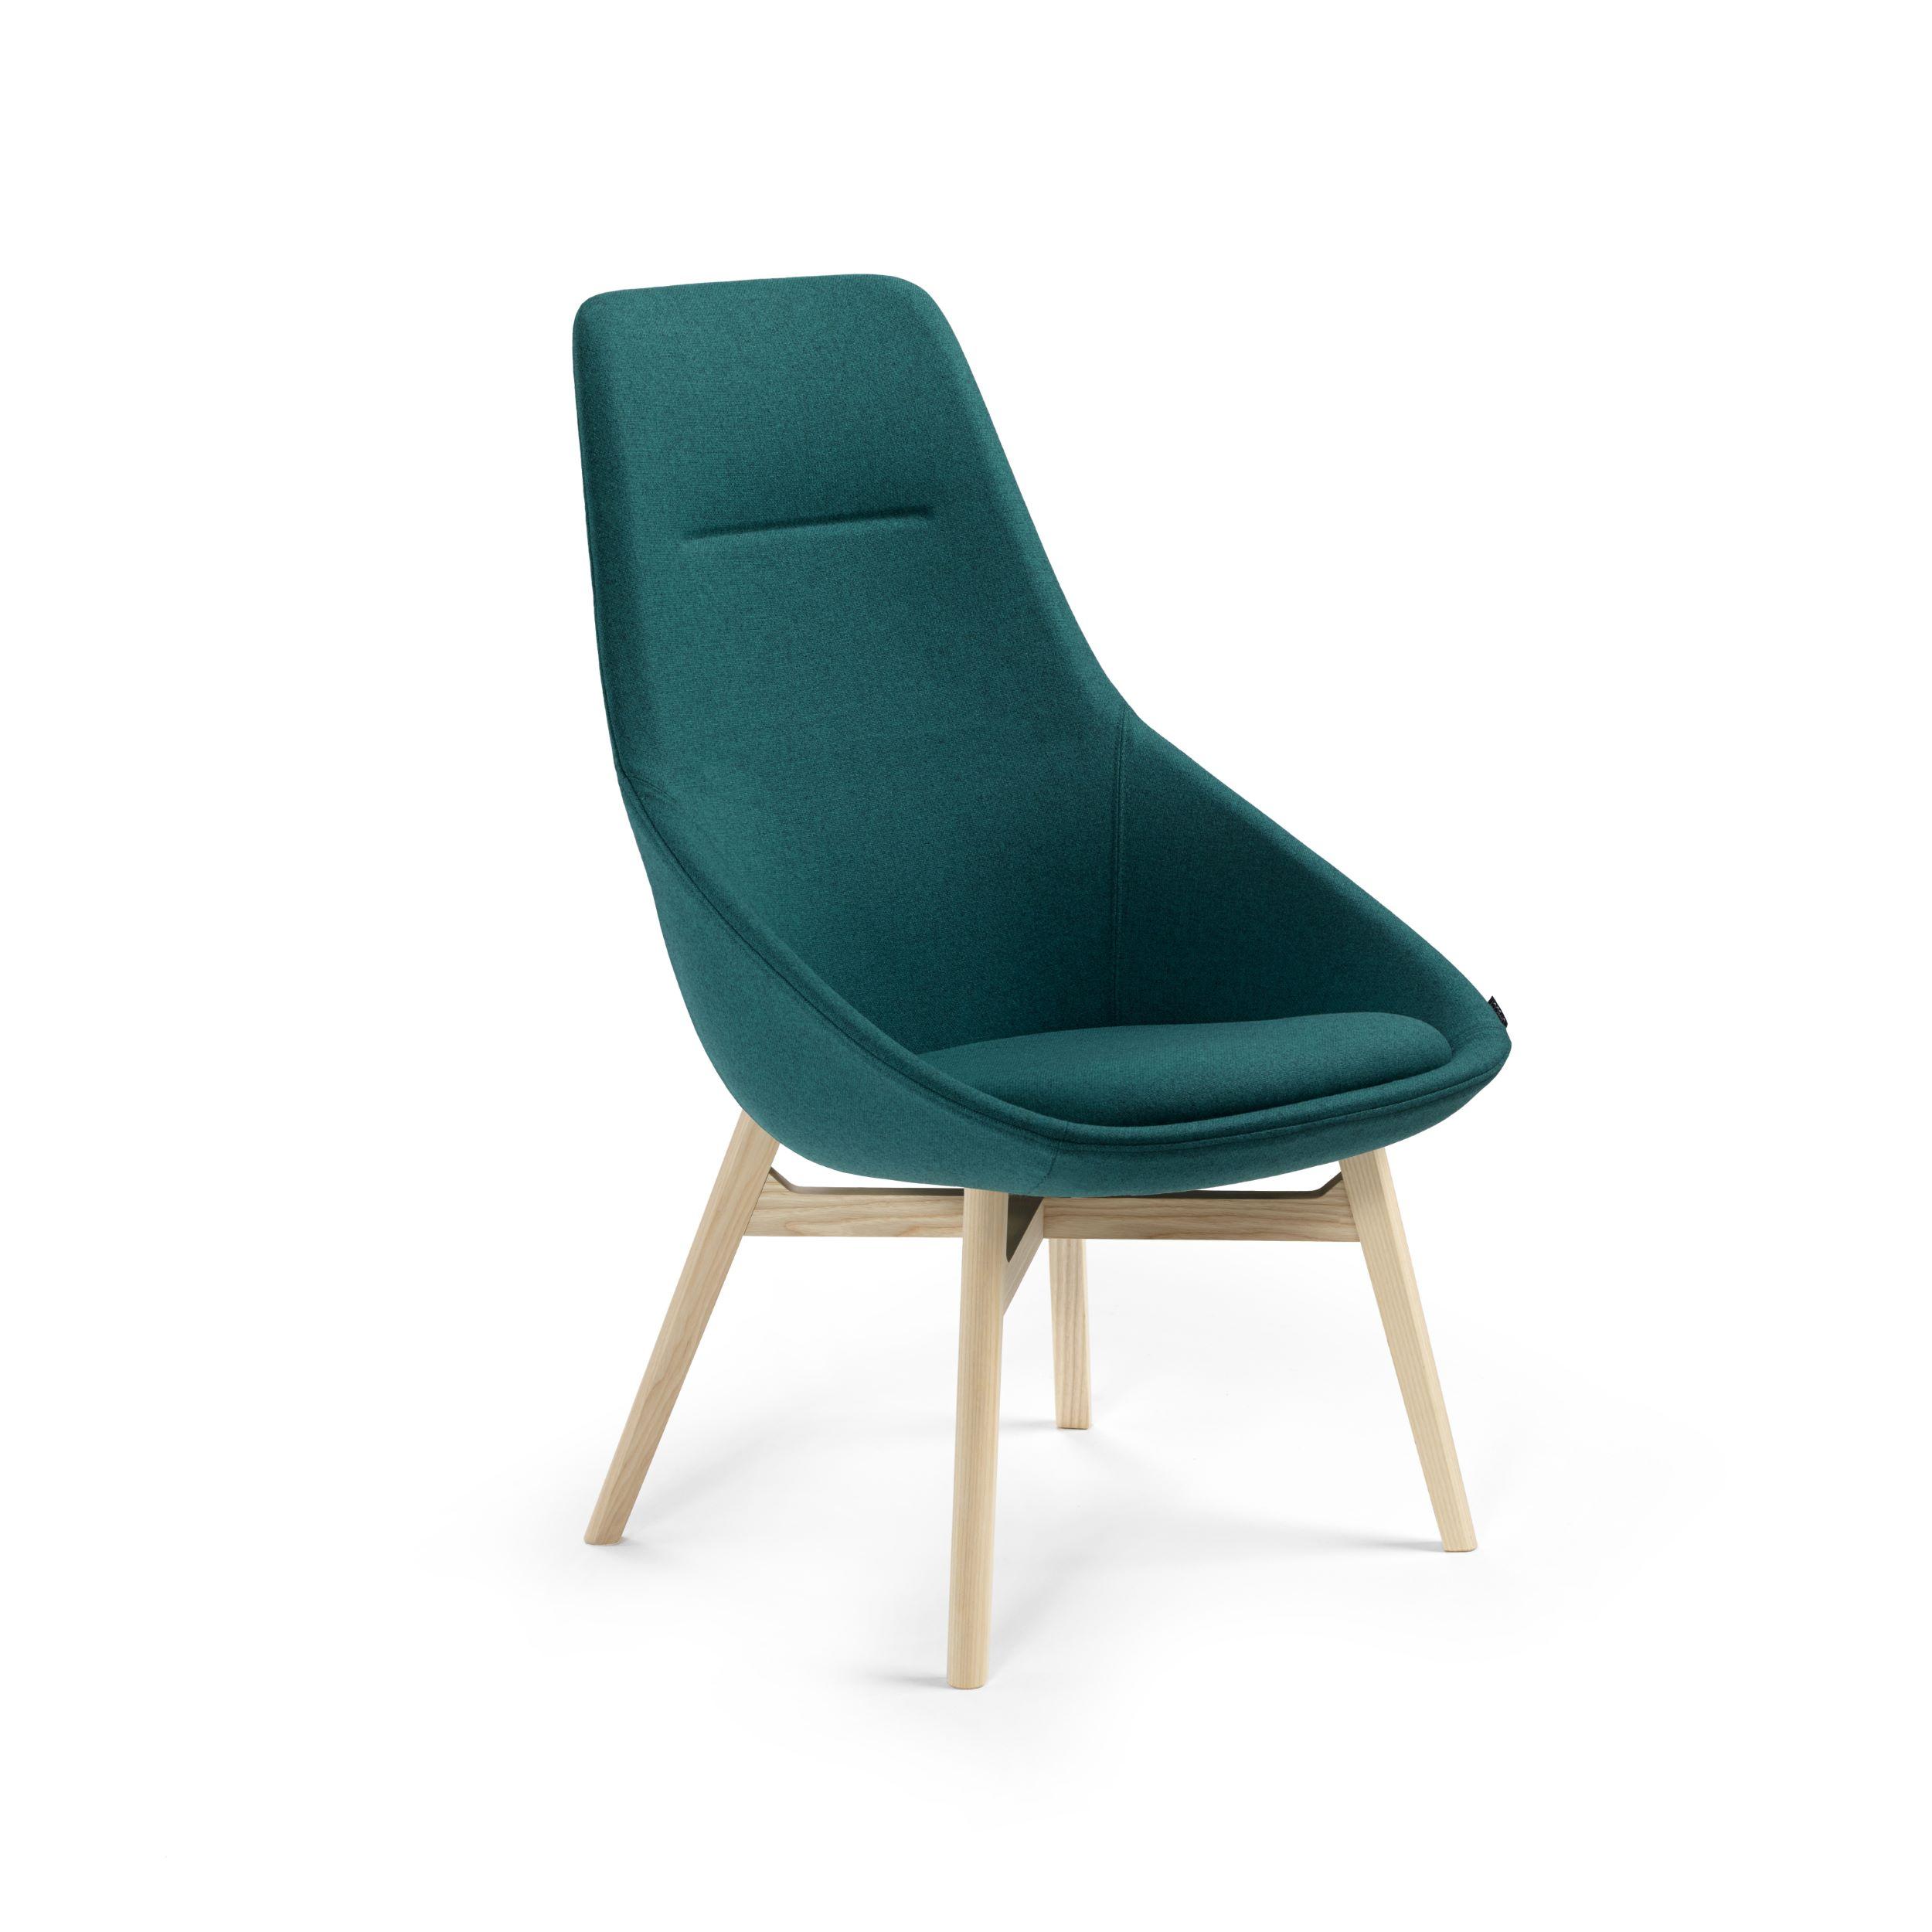 Ezy Wood High Chair